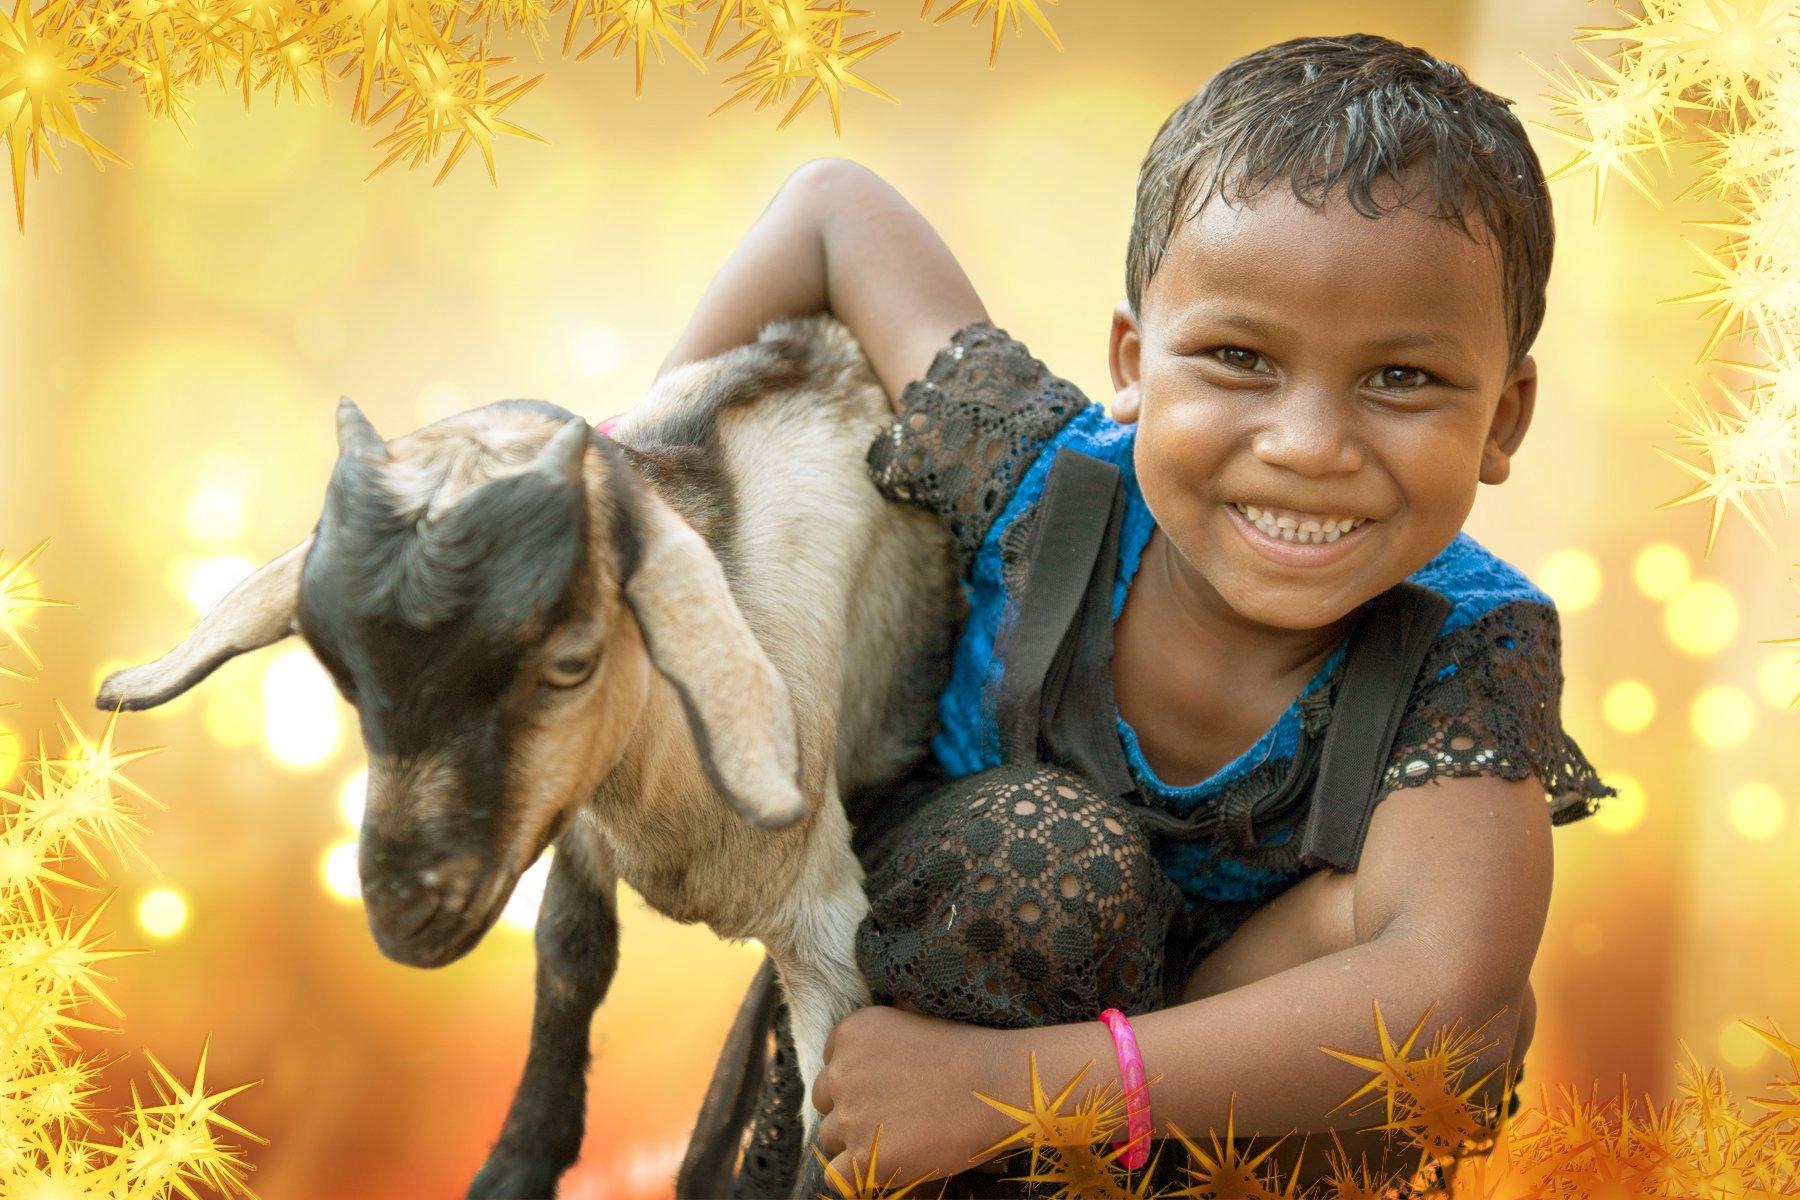 24-22-girl-with-goat.jpg